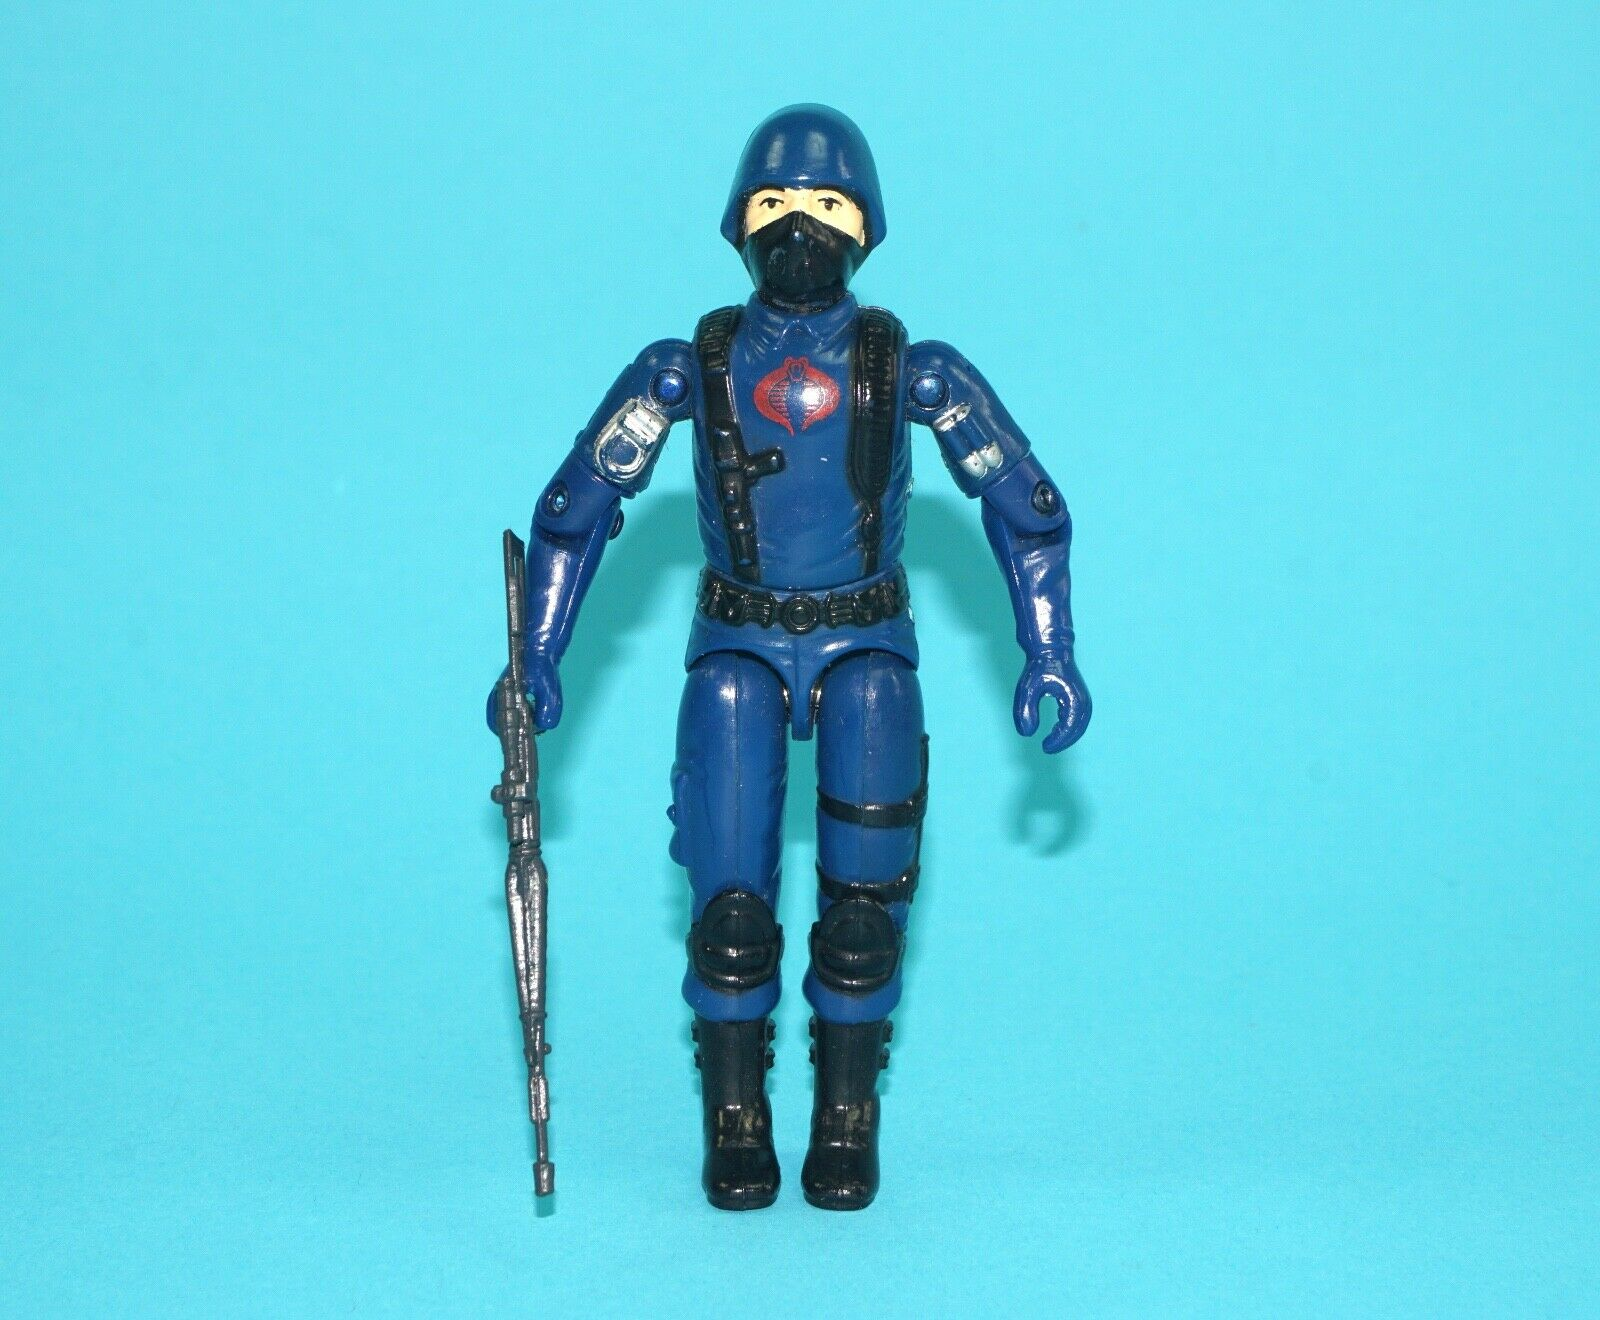 1983 GI JOE COBRA SOLDIER 'THE ENEMY' v1.5 100% COMPLETE C9 HASBRO